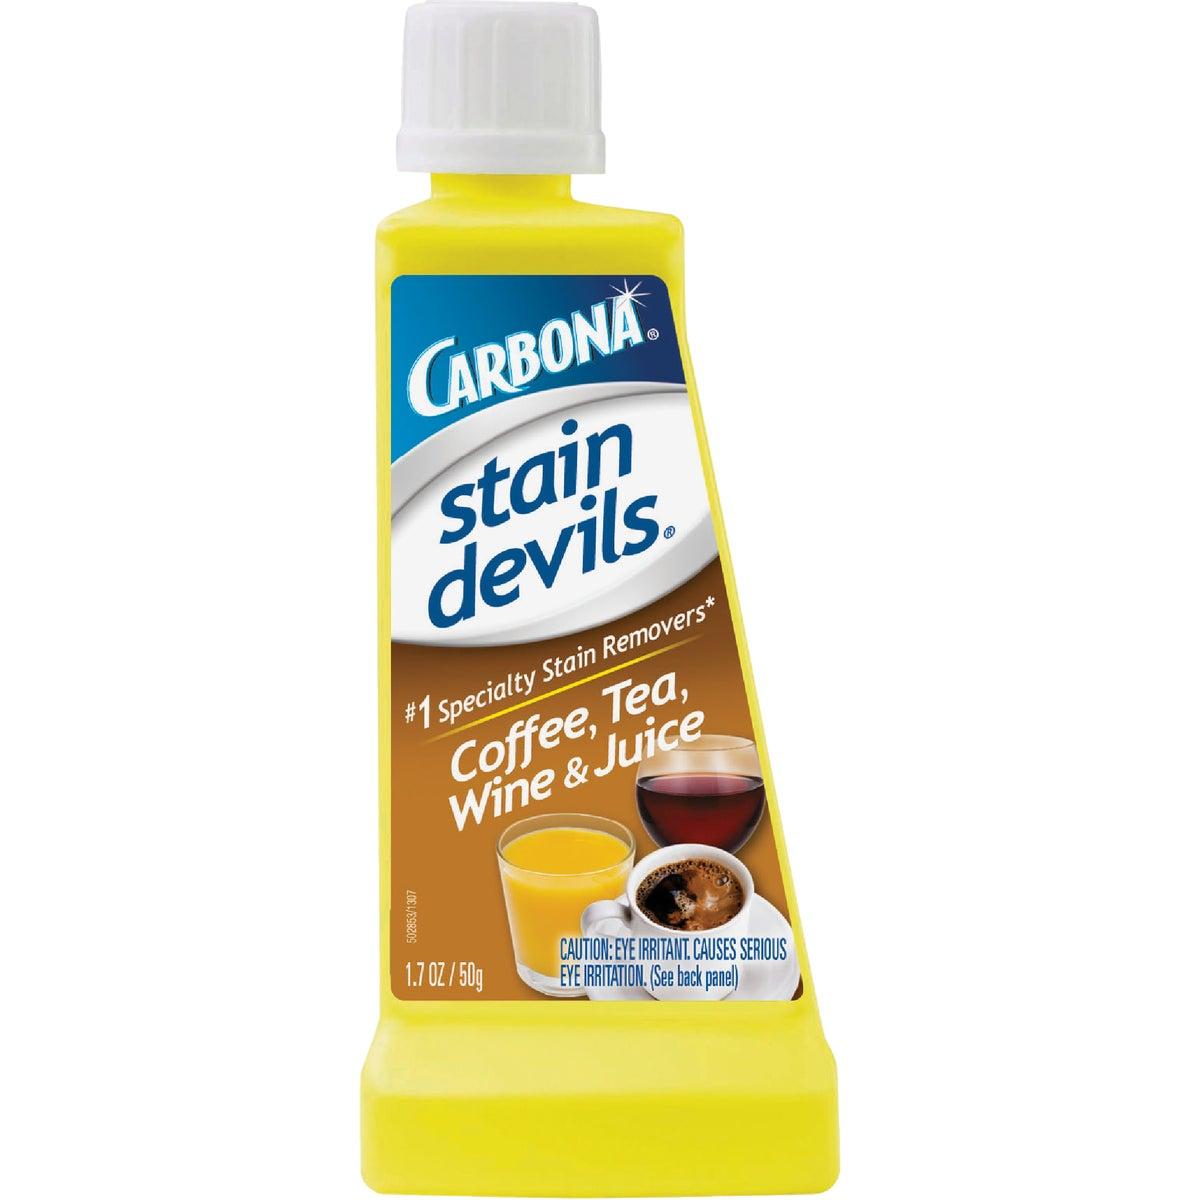 STAIN DEVILS #8 REMOVER